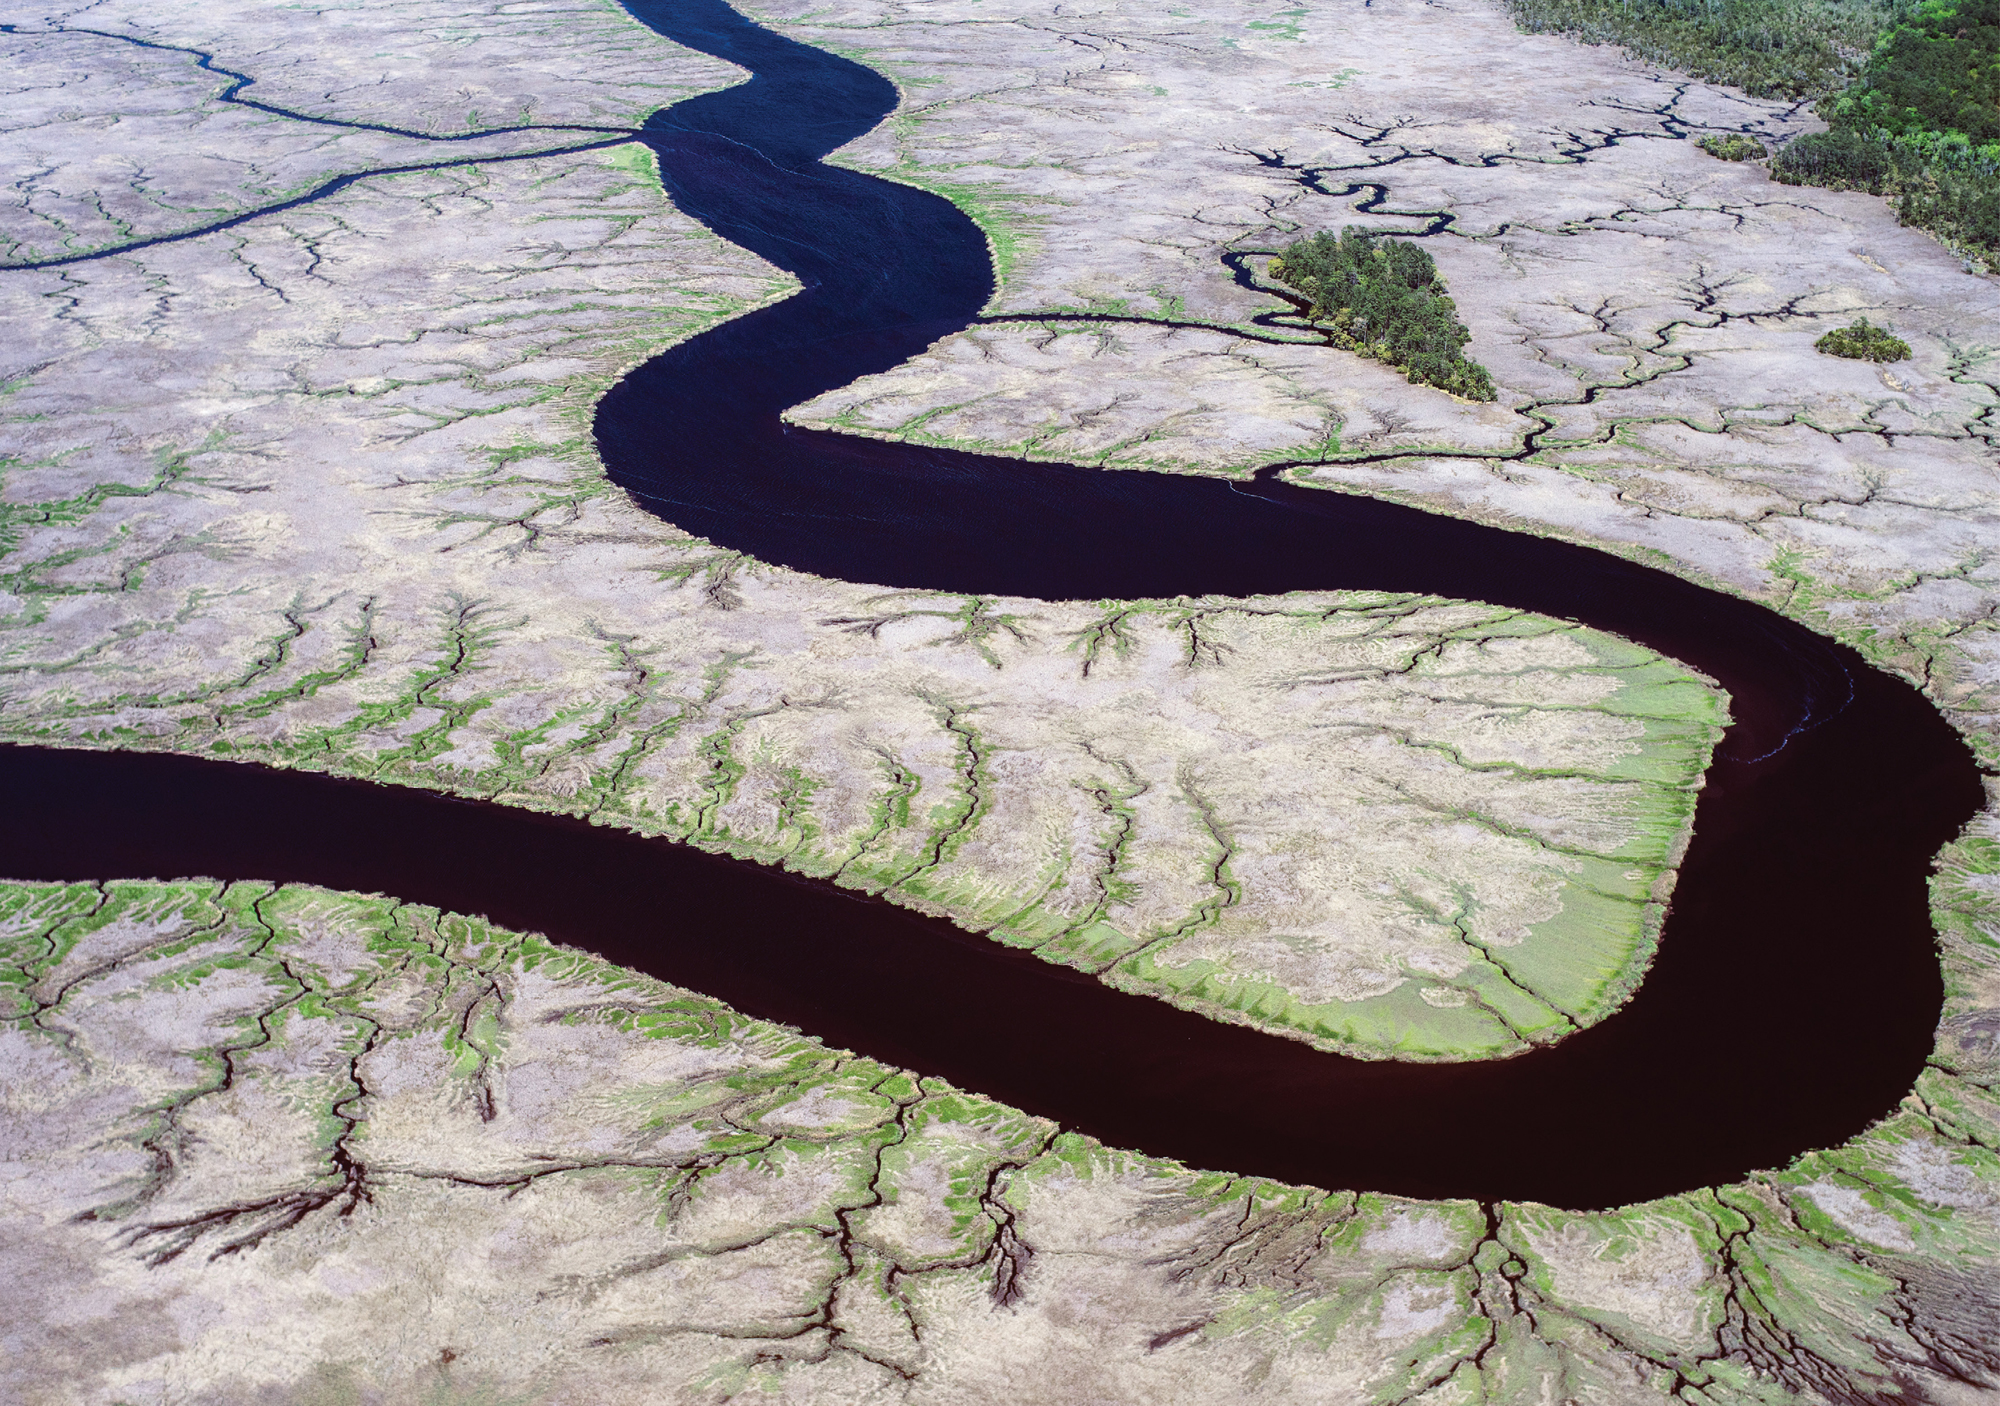 Wetlands in Spring with Fresh Green Growth (New River near Daufuskie Island; April 9, 2015)